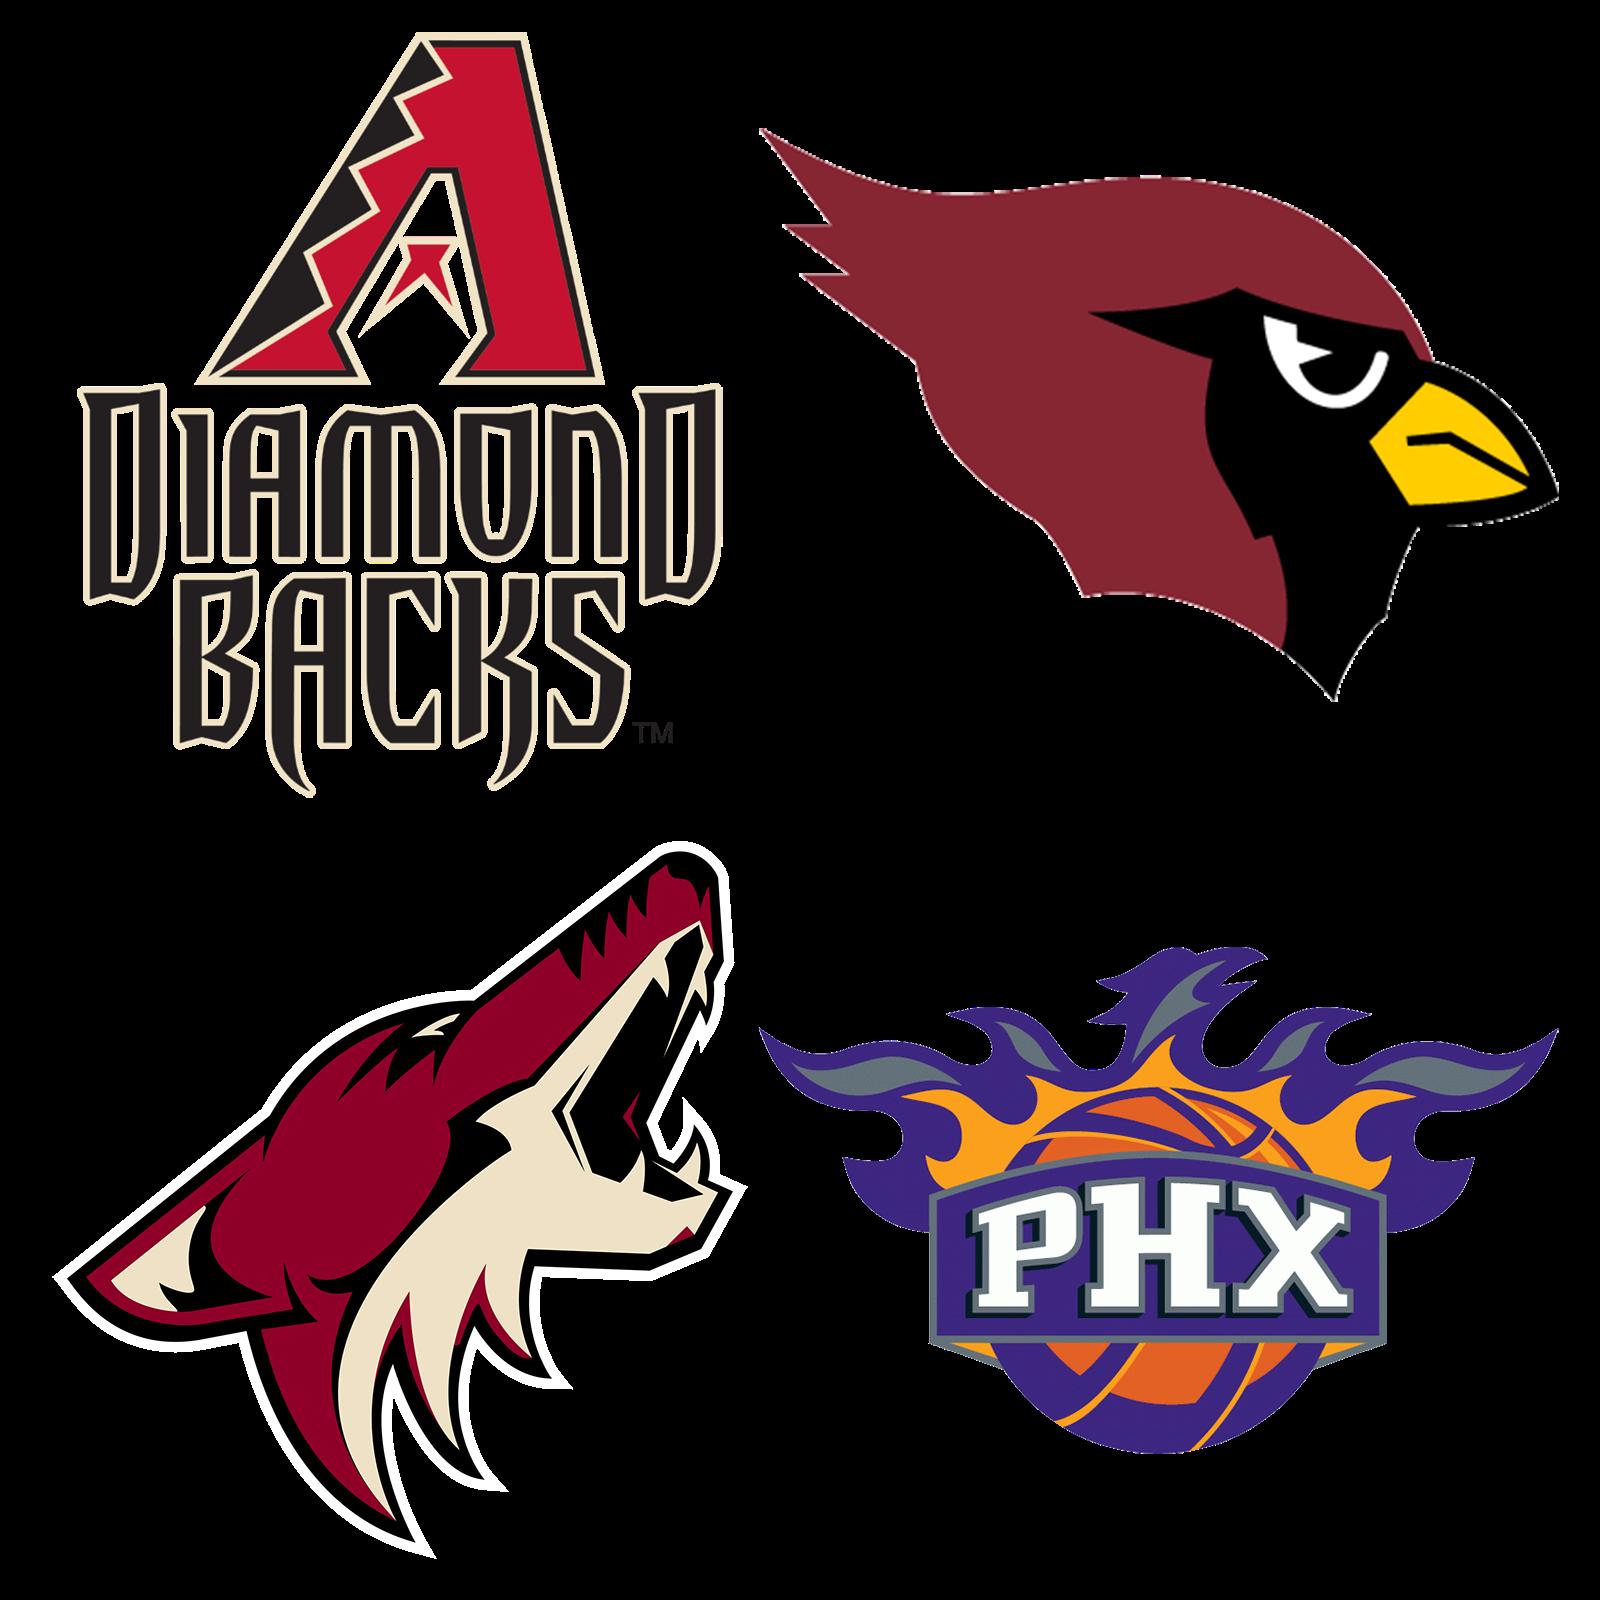 Professional sports team logos